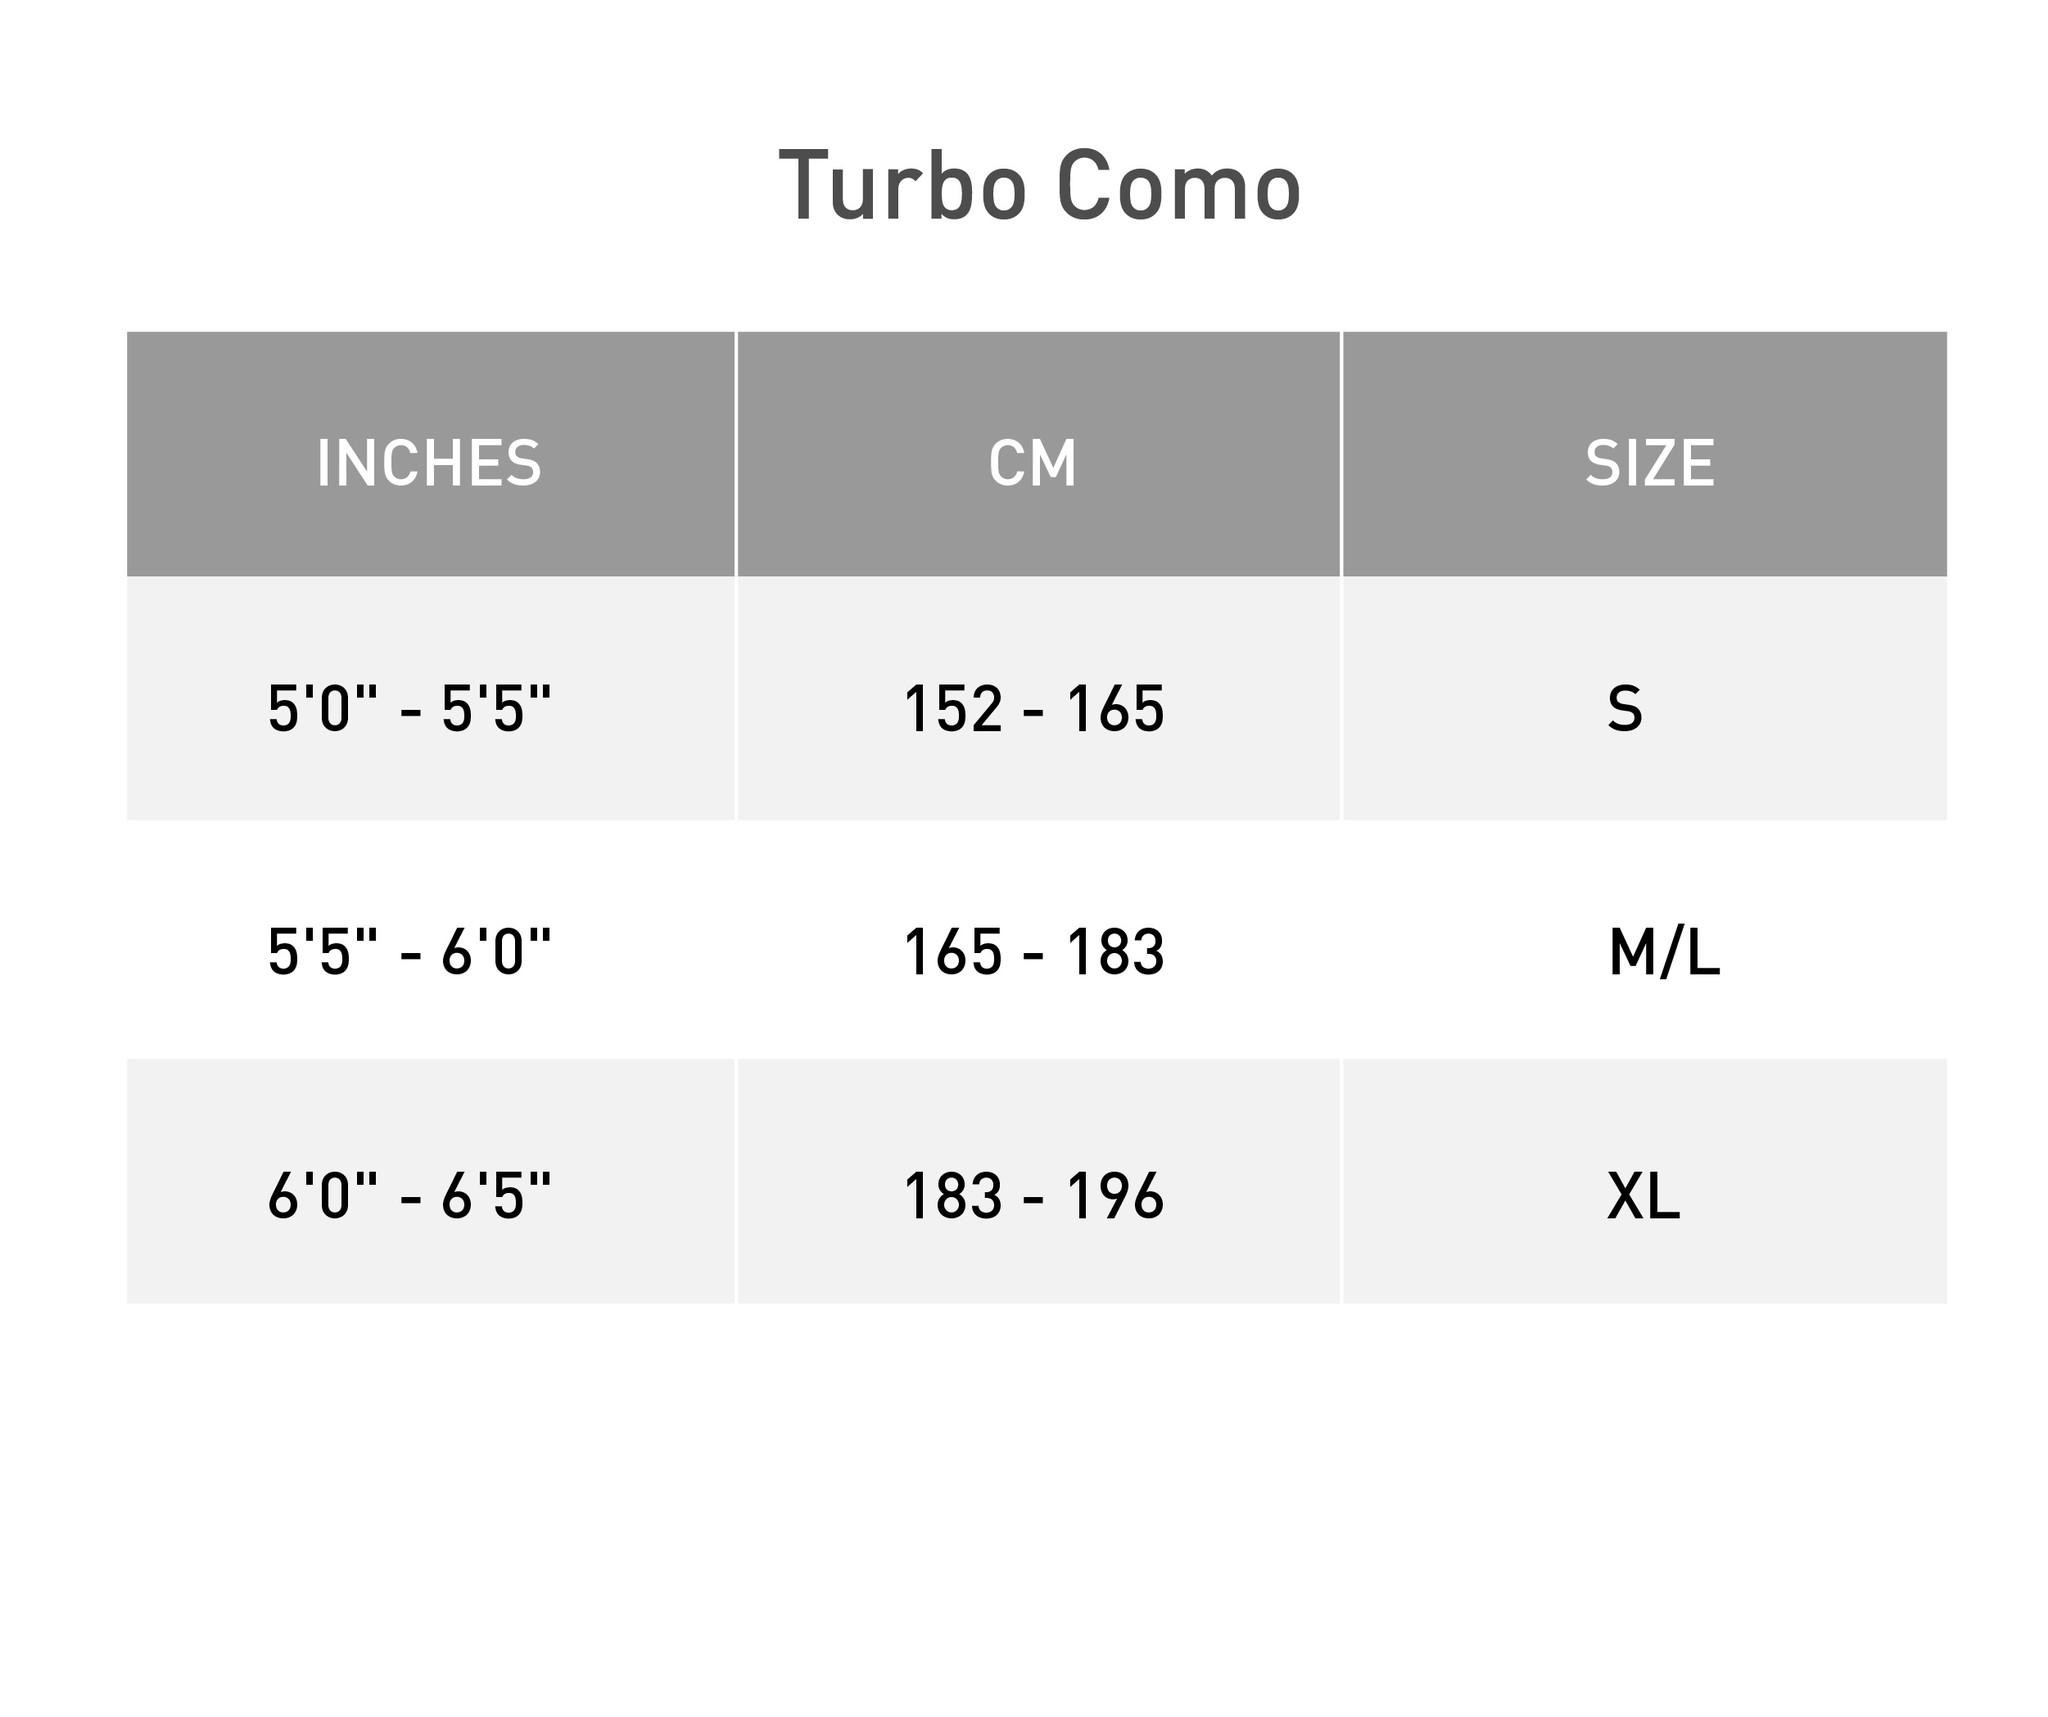 Turbo Como Size Chart